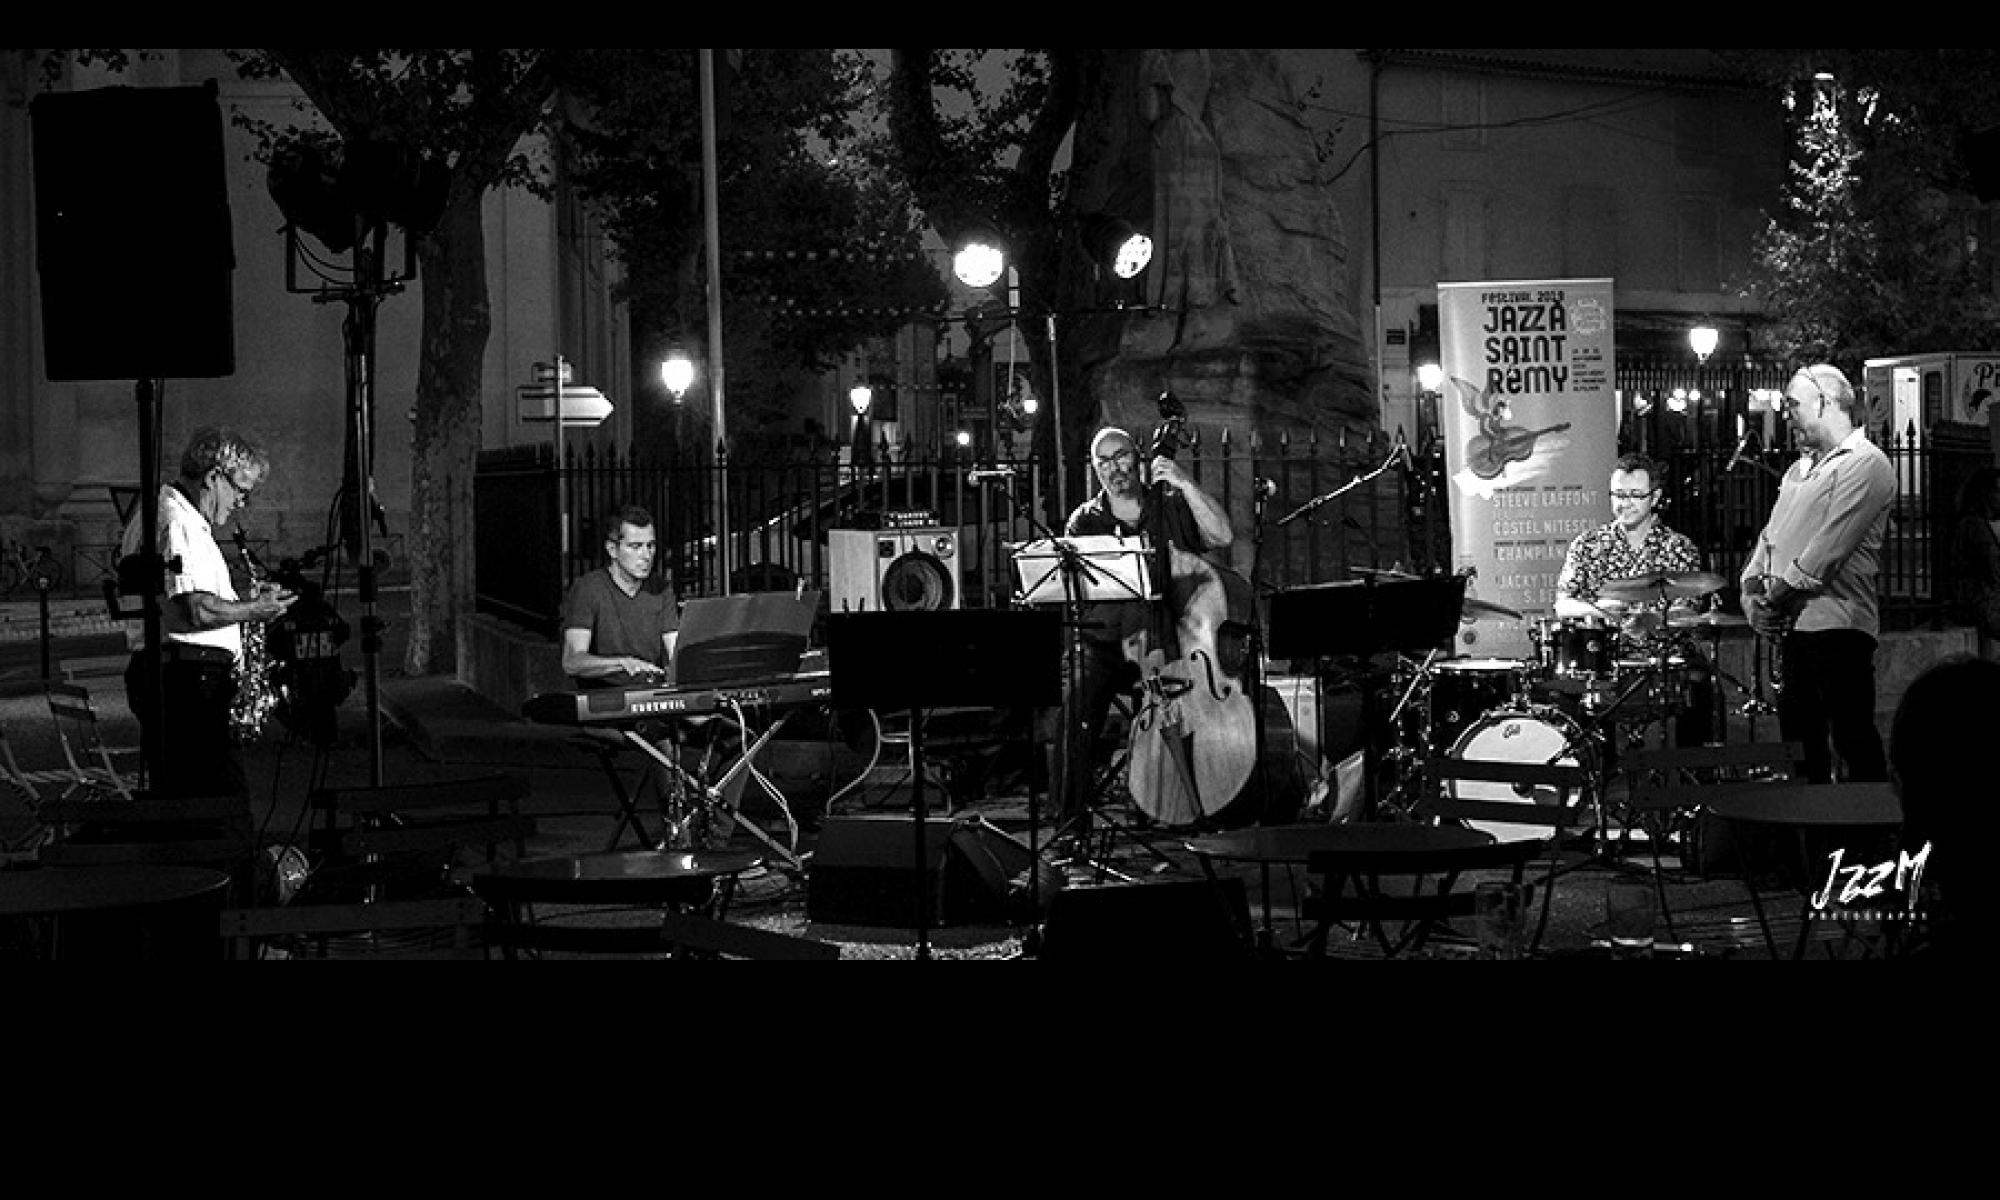 cantaloupe quintet